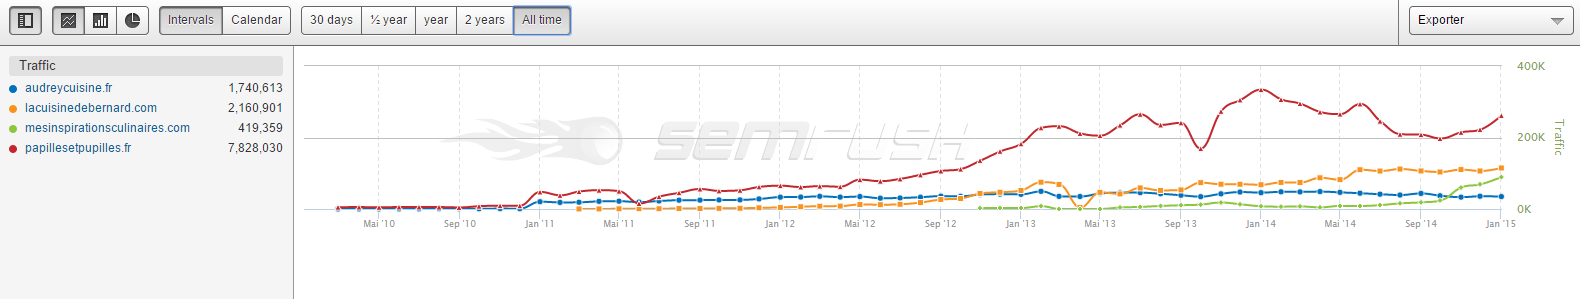 trafic-internet-depuis-2011